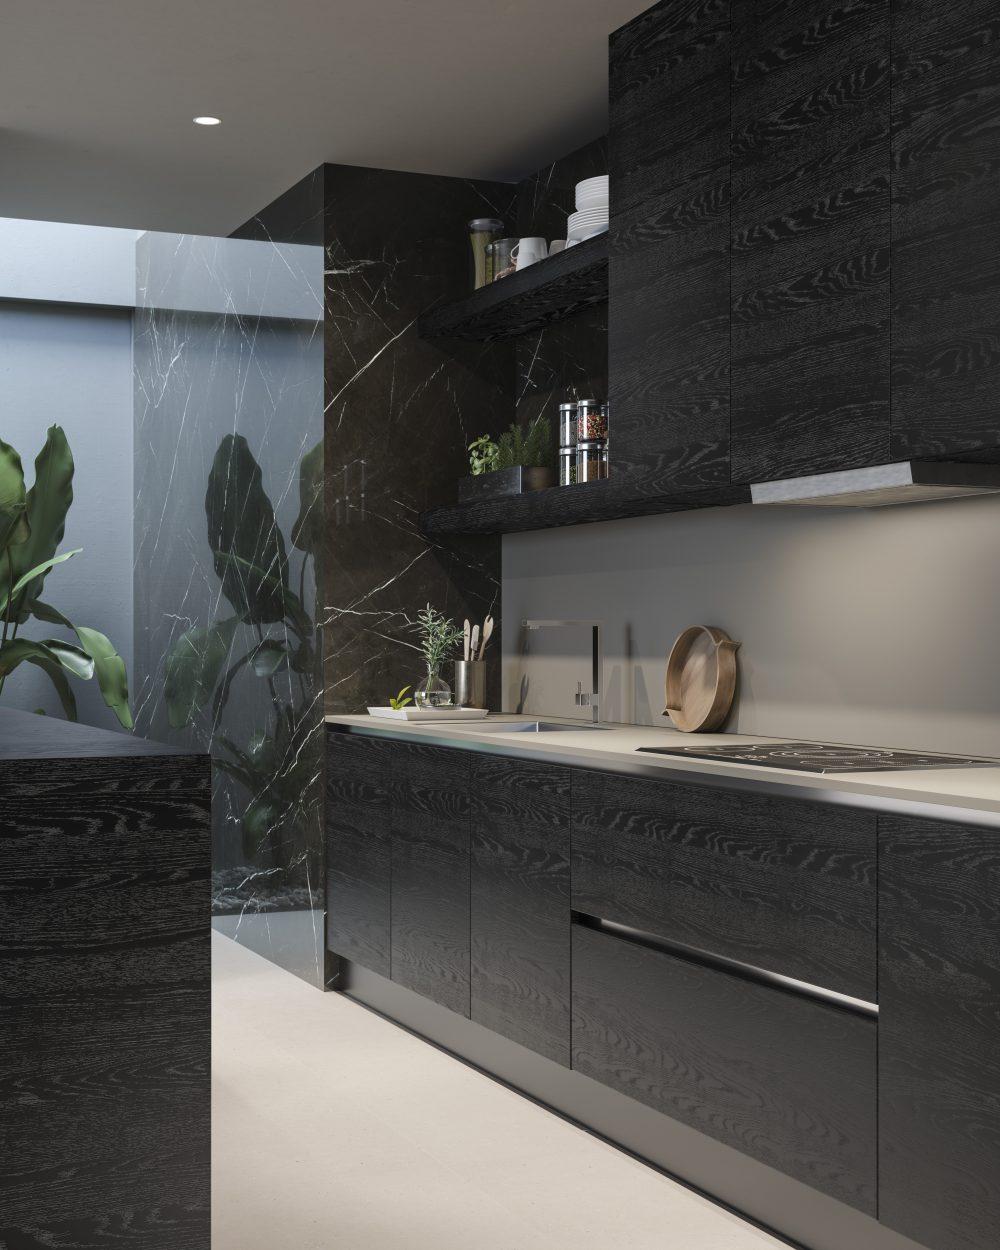 Porte interne in vetro e rivestimenti cucina Garofoli Rovere Nero Profondo - Garofoli